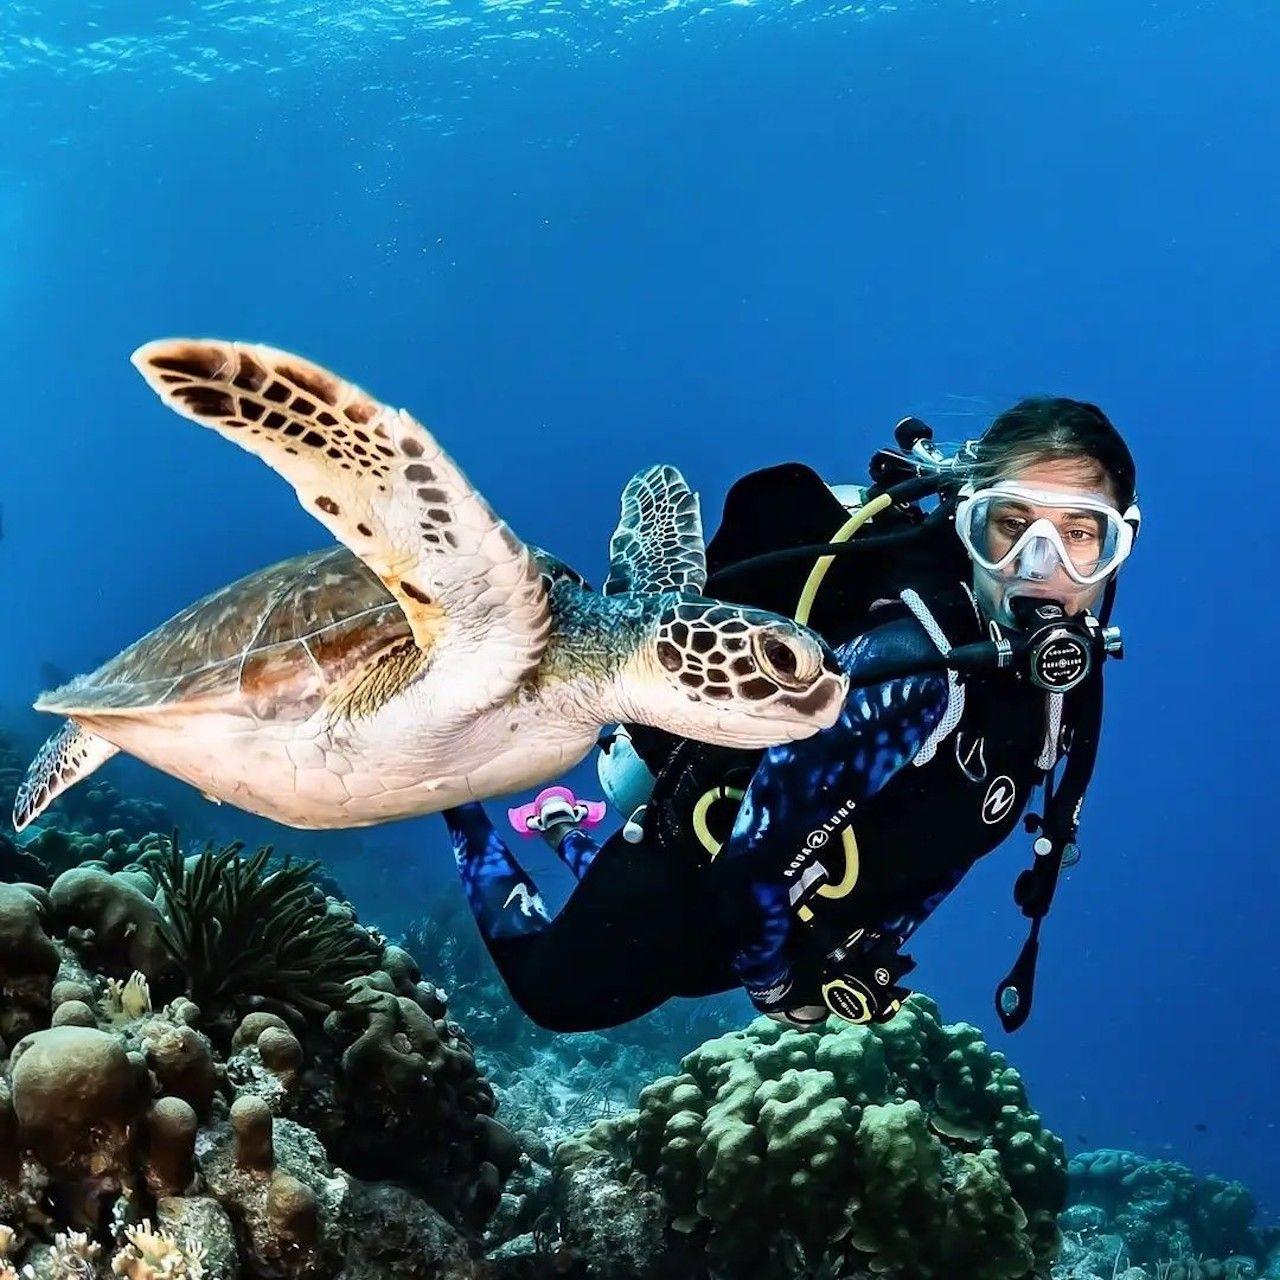 Female scuba diver admires a sea turtle underwater in Dubai